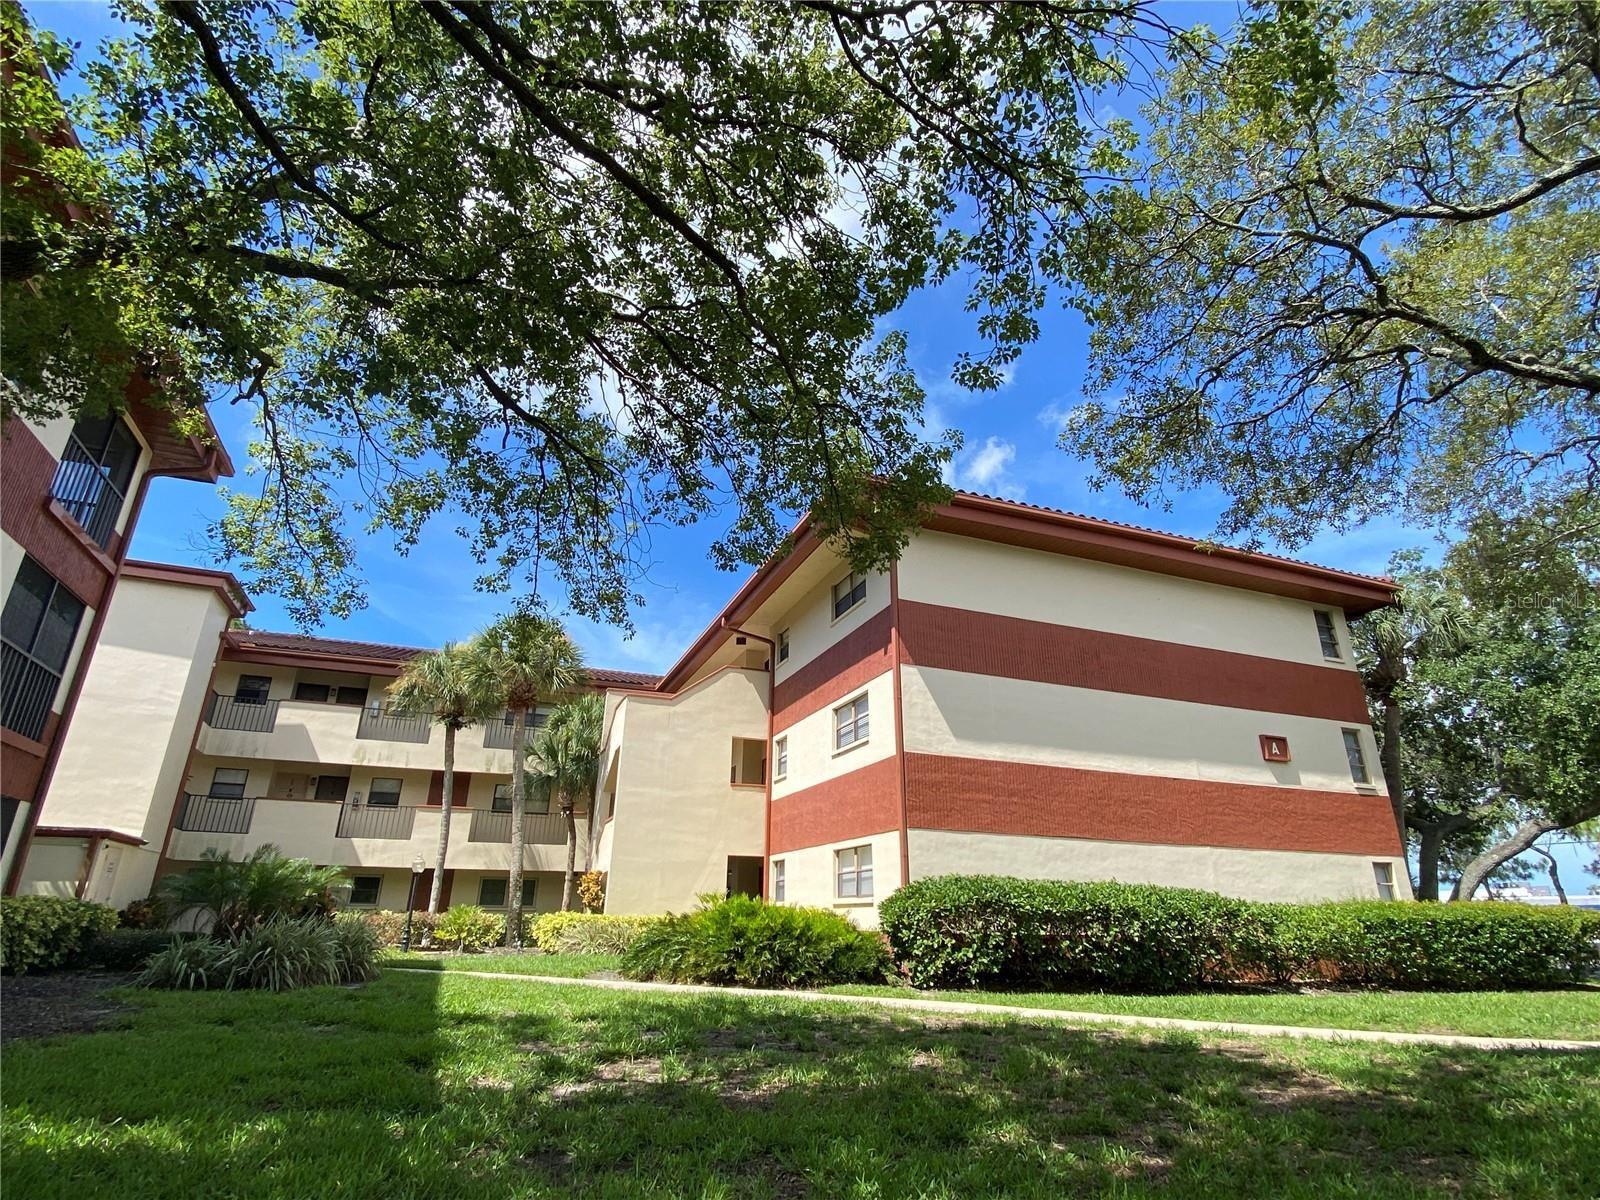 2650 COUNTRYSIDE BOULEVARD #A102, Clearwater, FL 33761 - #: U8128467